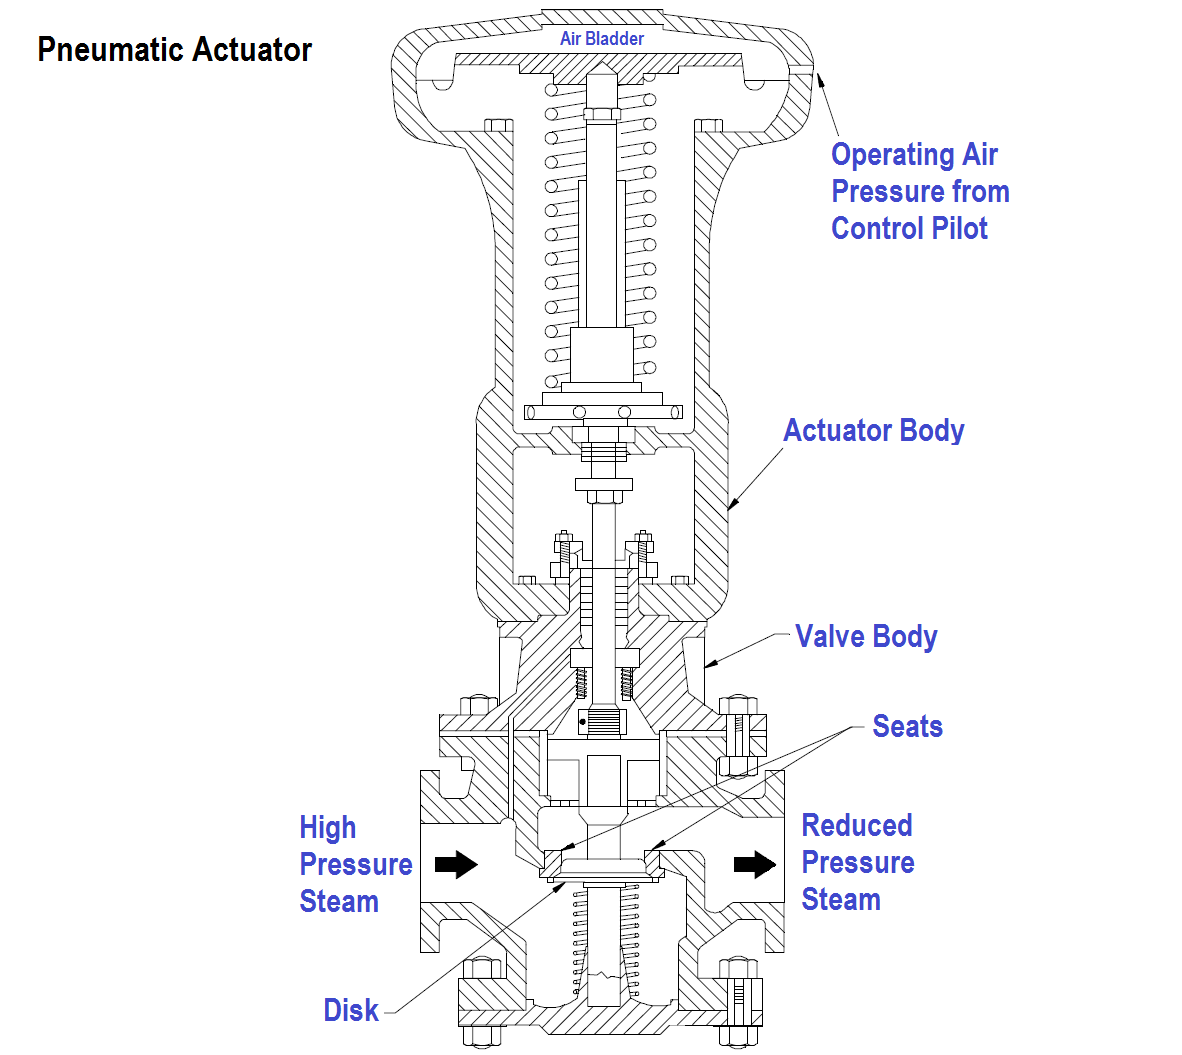 self actuated valves pneumatic hydraulic actuators [ 1182 x 1055 Pixel ]